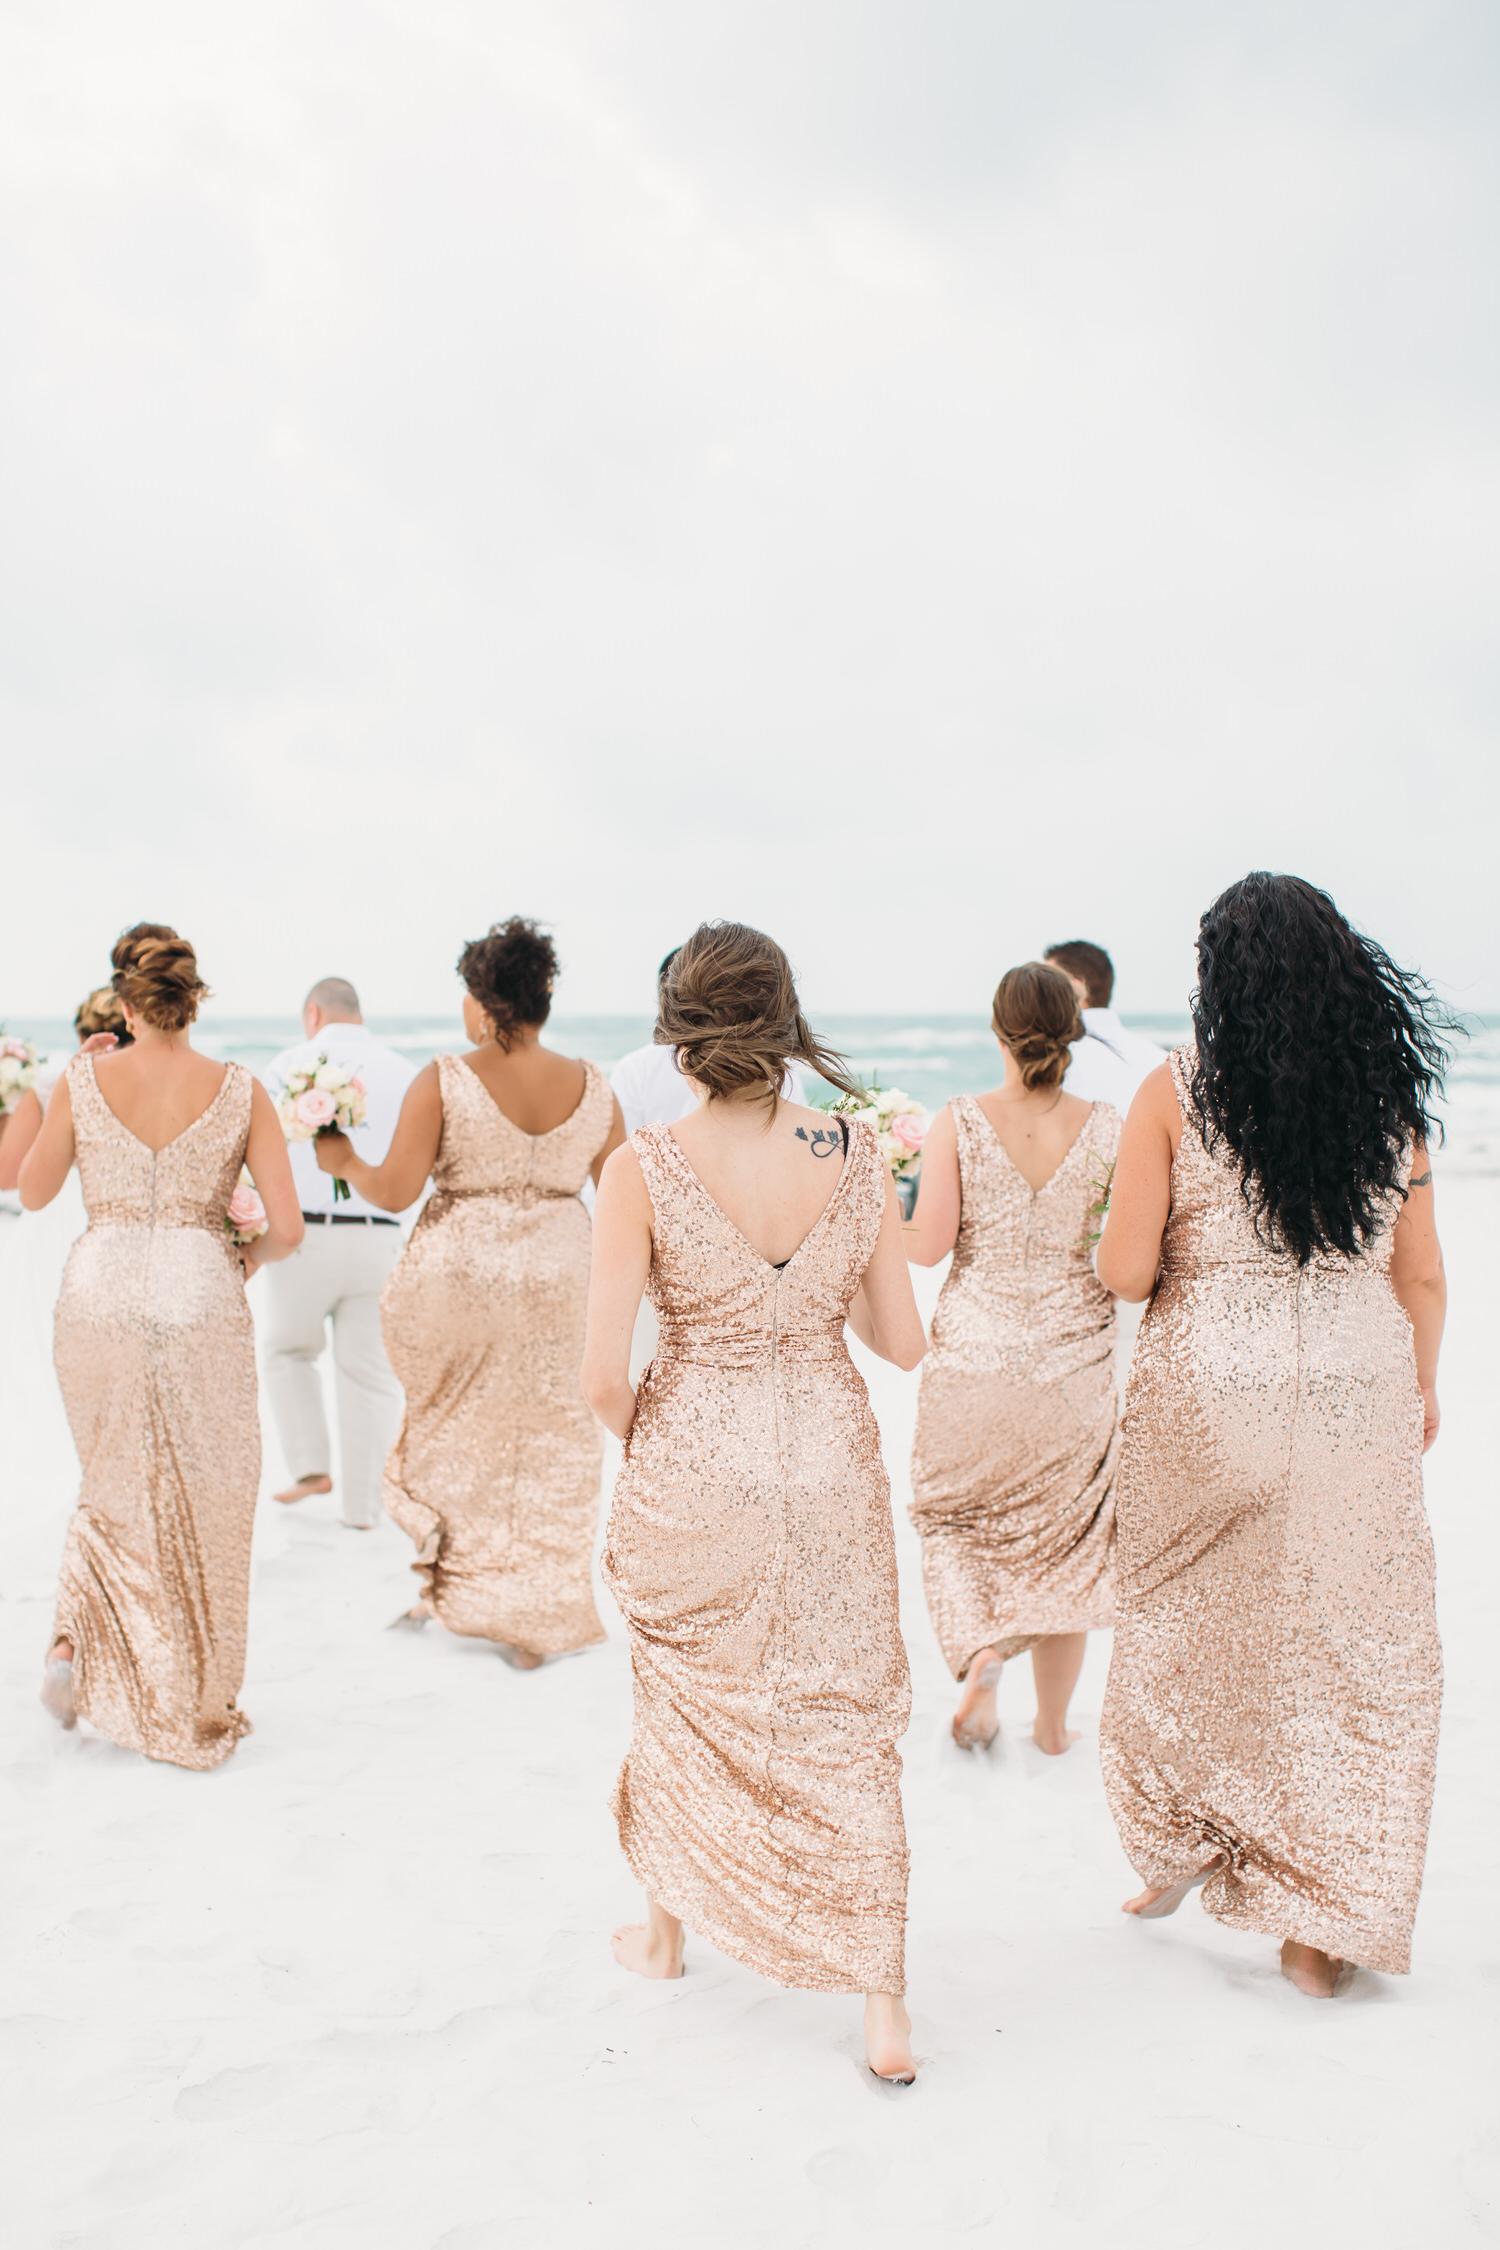 Lido Key Florida Beach wedding